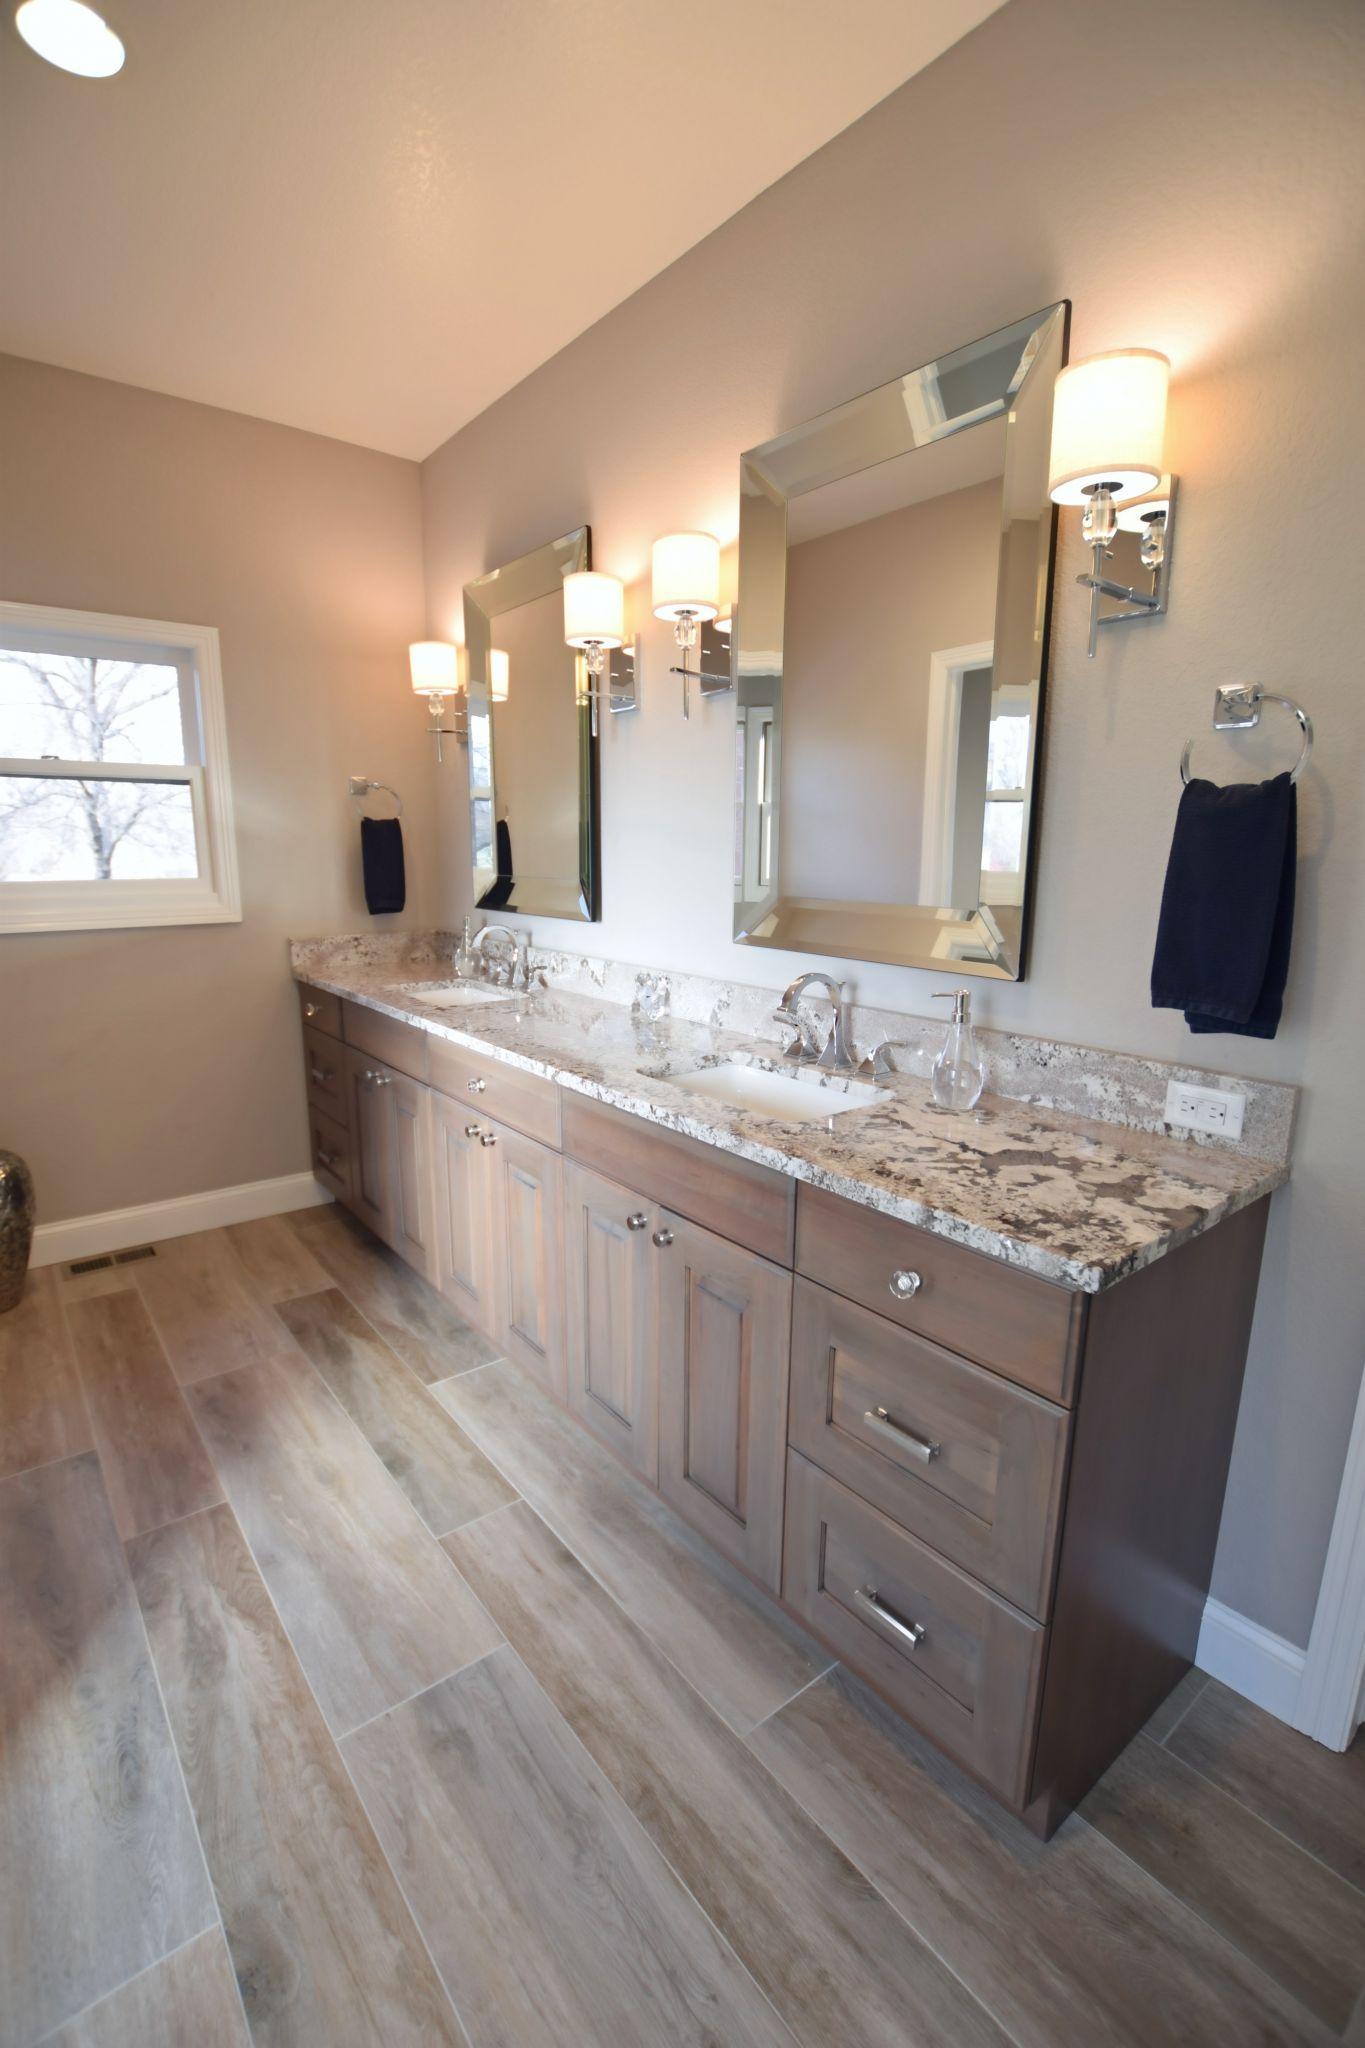 Bkc Kitchen And Bath Crystal Cabinets Kitchen Bath Bathroom Cabinetry Bath